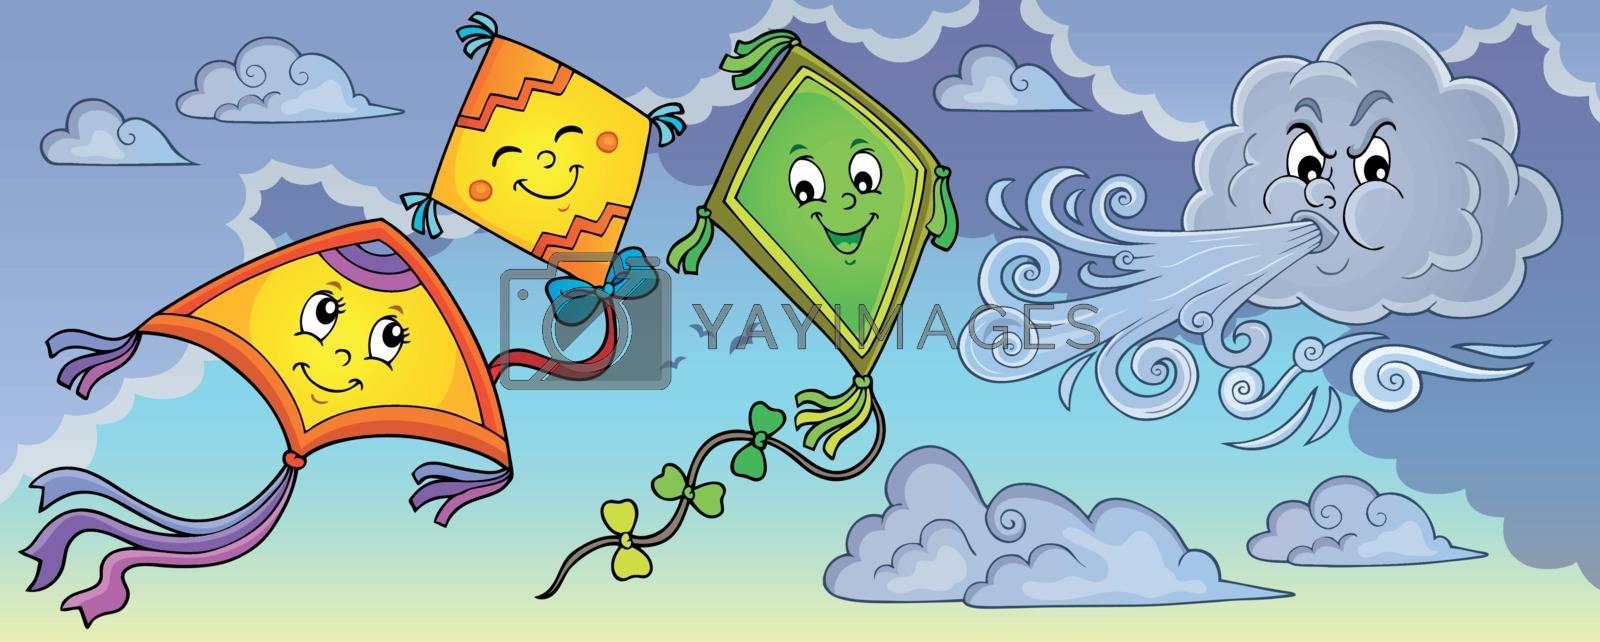 Happy autumn kites topic image 1 - eps10 vector illustration.